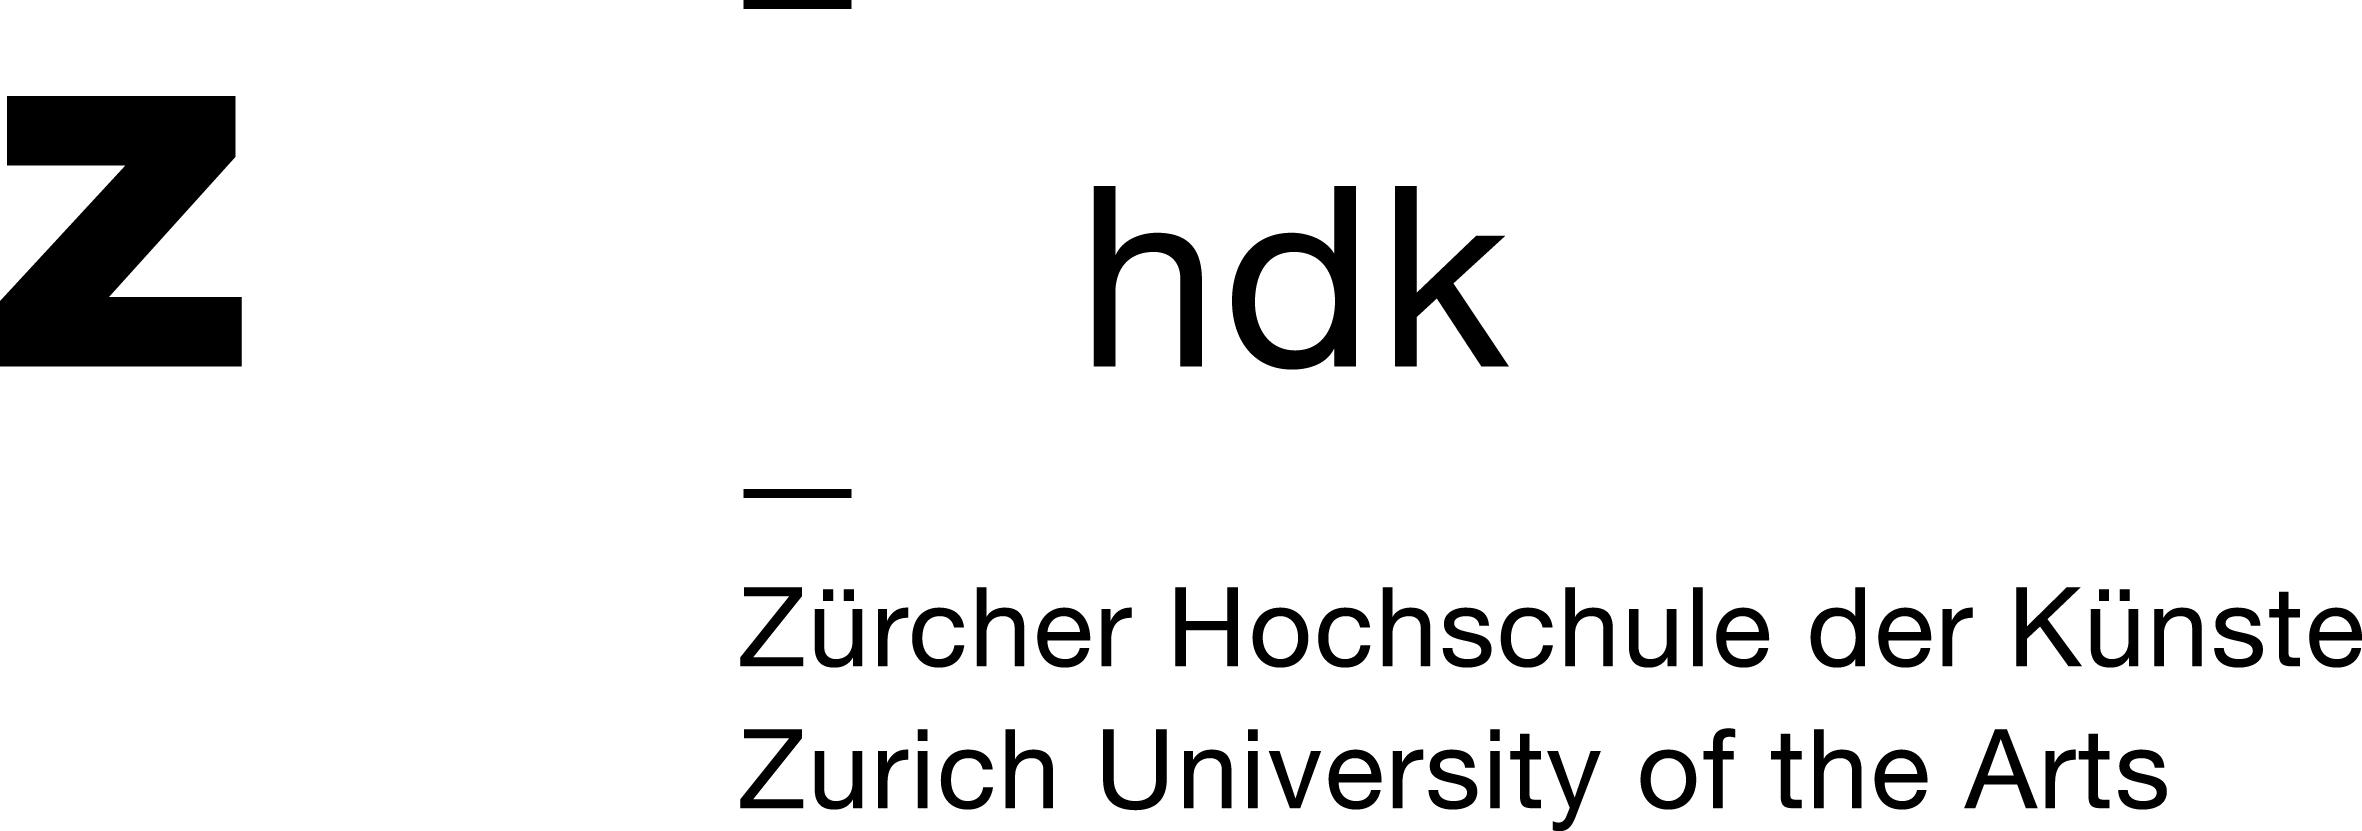 logozhdk_1-4bmHR.jpg